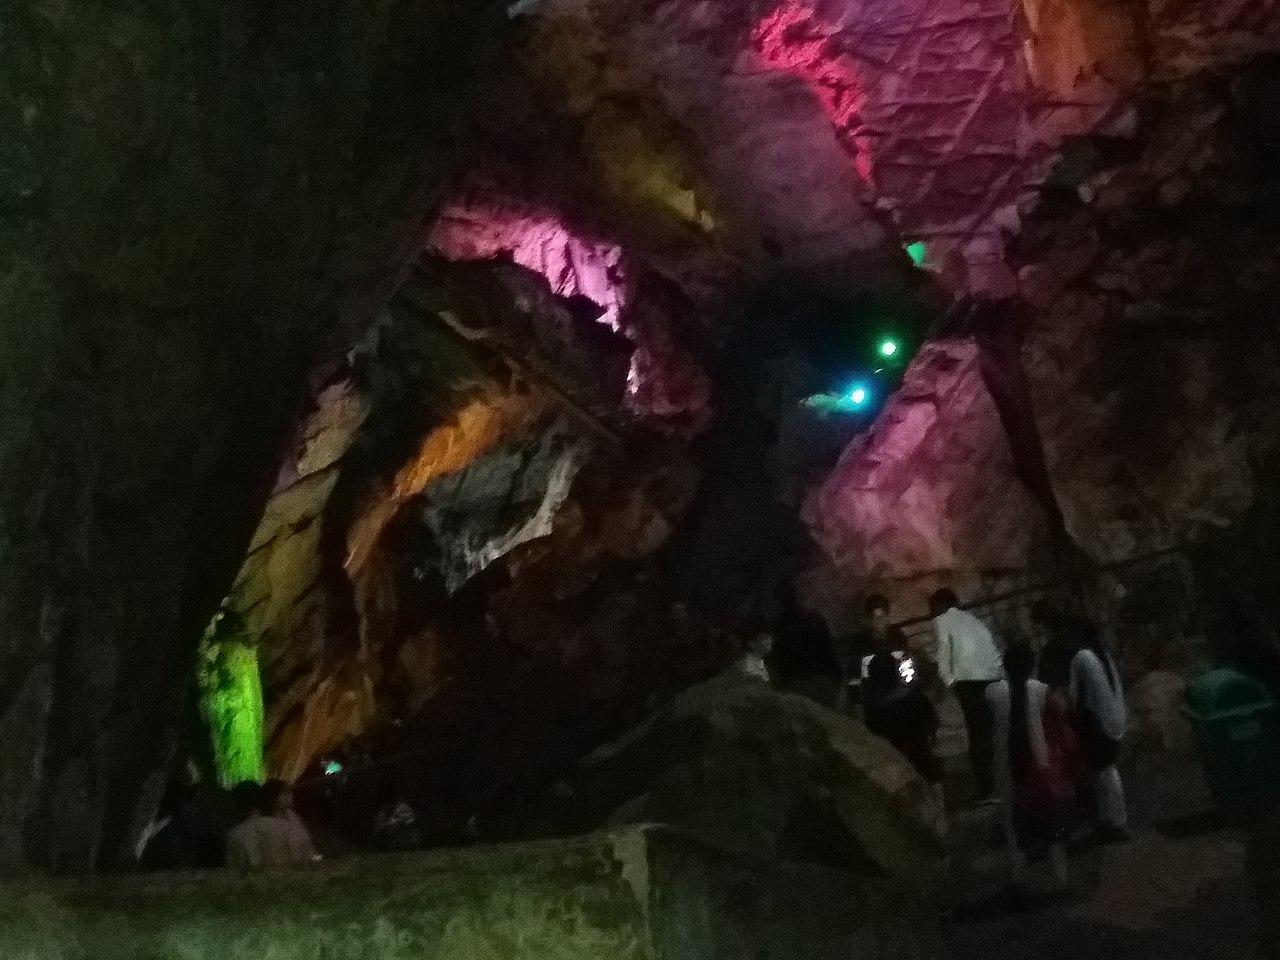 Attractions at the Borra Caves in Araku Valley, Visakhapatnam, Andhra Pradesh